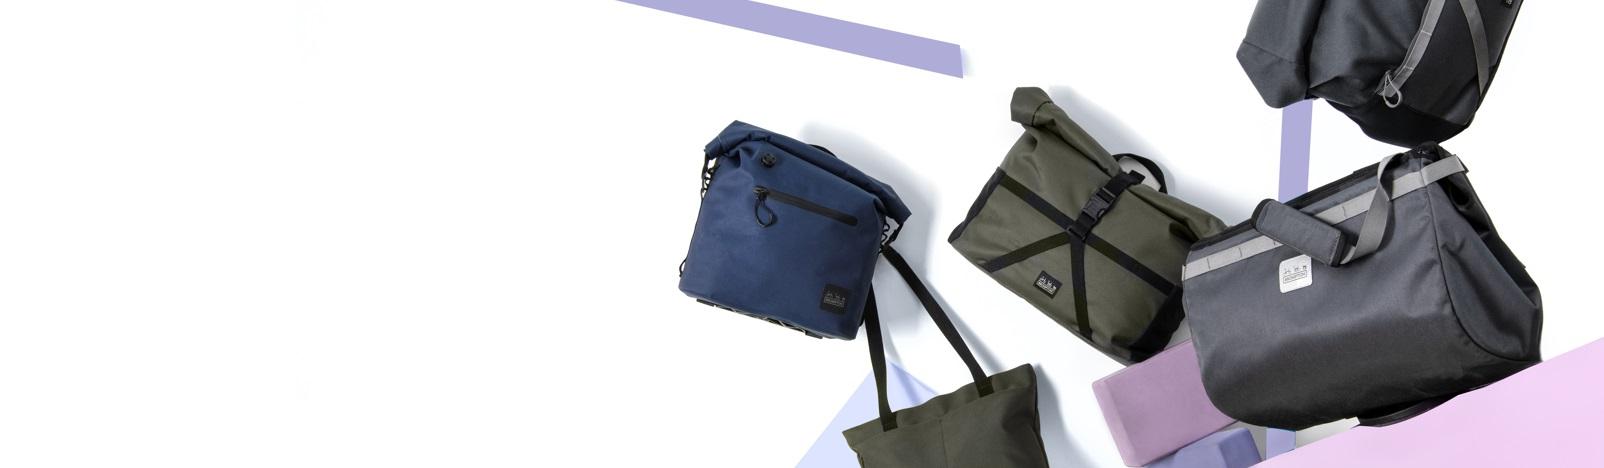 Bicycle transport bags, panniers, Brompton Bicycle MY20 luggage